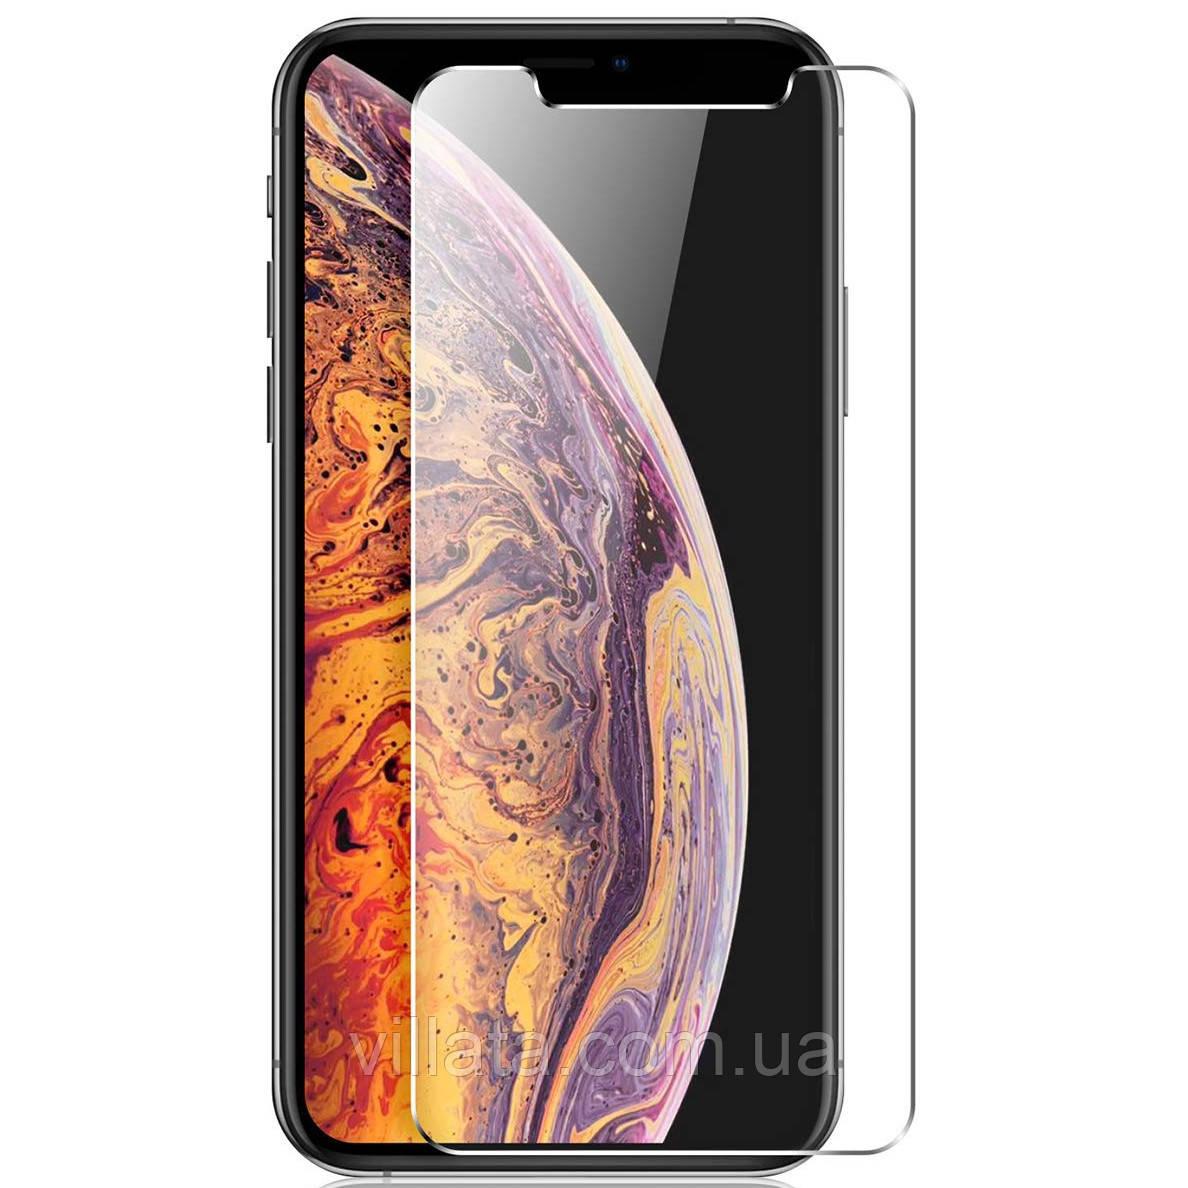 "Защитное стекло Ultra 0.33mm (без упаковки) для Apple iPhone 11 Pro (5.8"") / X / XS"